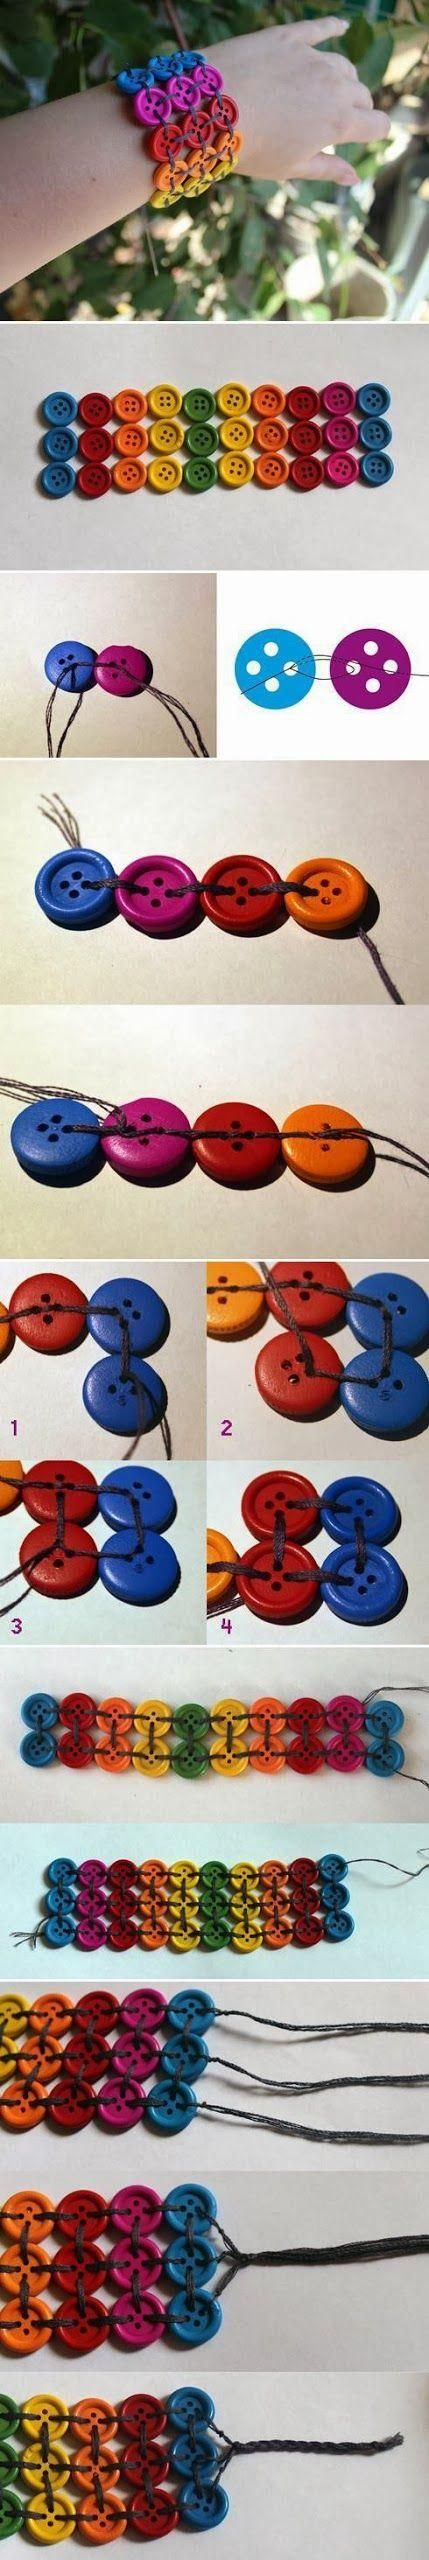 Craft ideas 875 - Pandahall.com